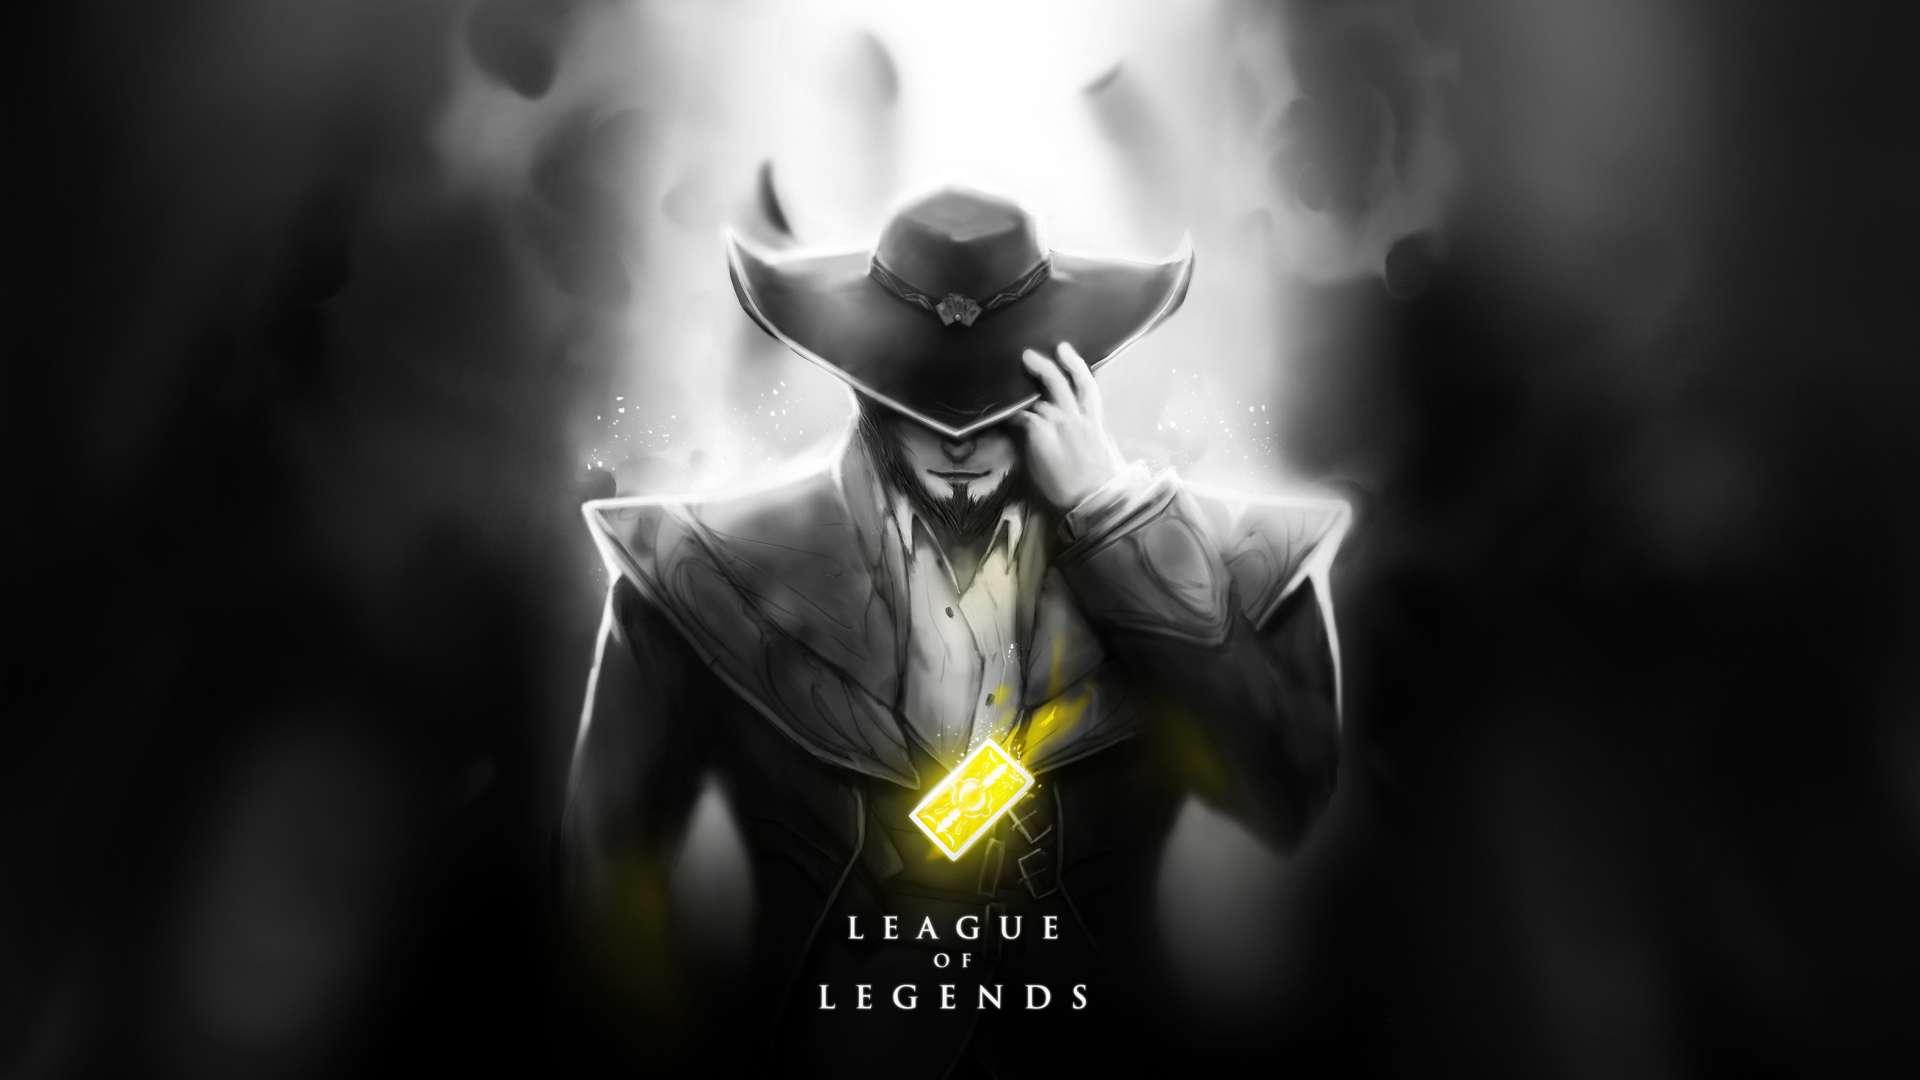 League of Legends Wallpaper 116